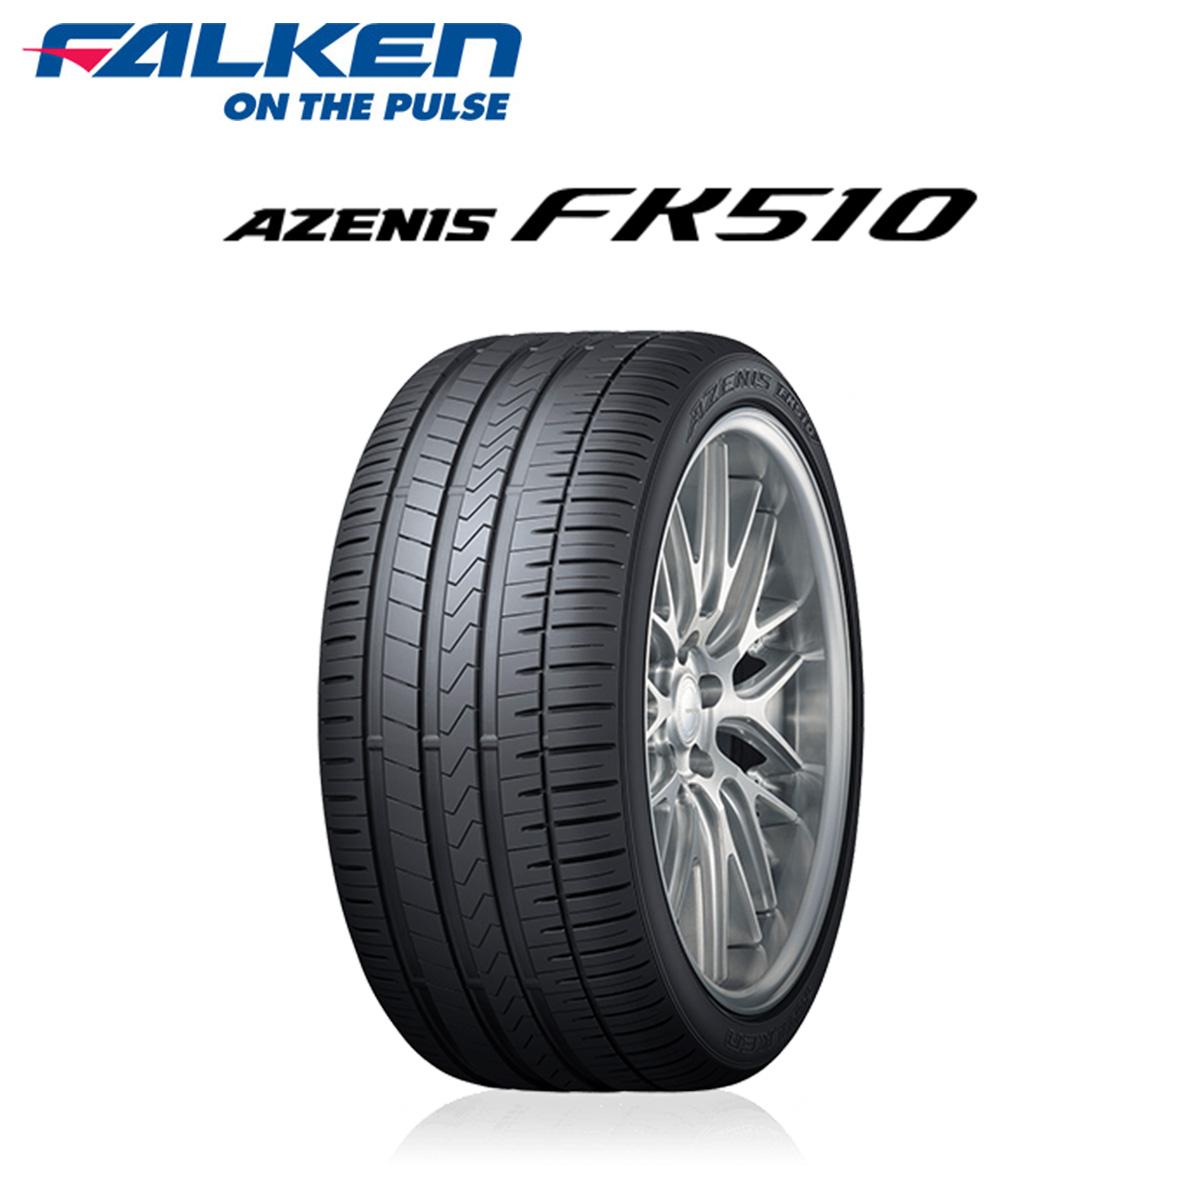 FALKEN ファルケン プレミアム フラッグシップ 4WD 4X4 4駆 タイヤ 1本 18インチ 235/50R18 AZENIS FK510 SUV アゼニス